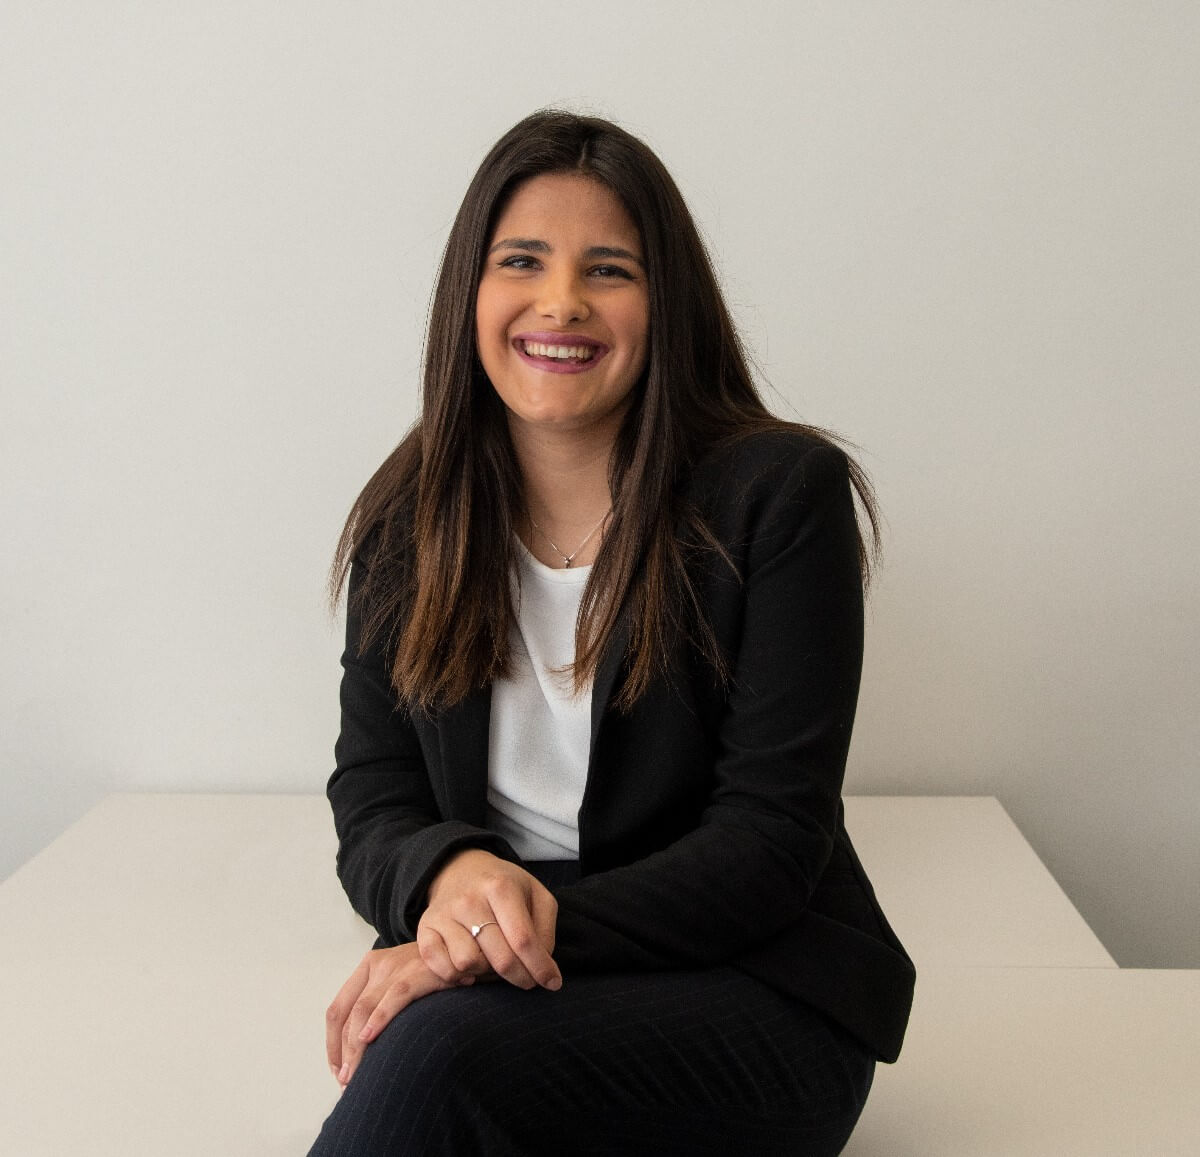 Aida Villalba Mora